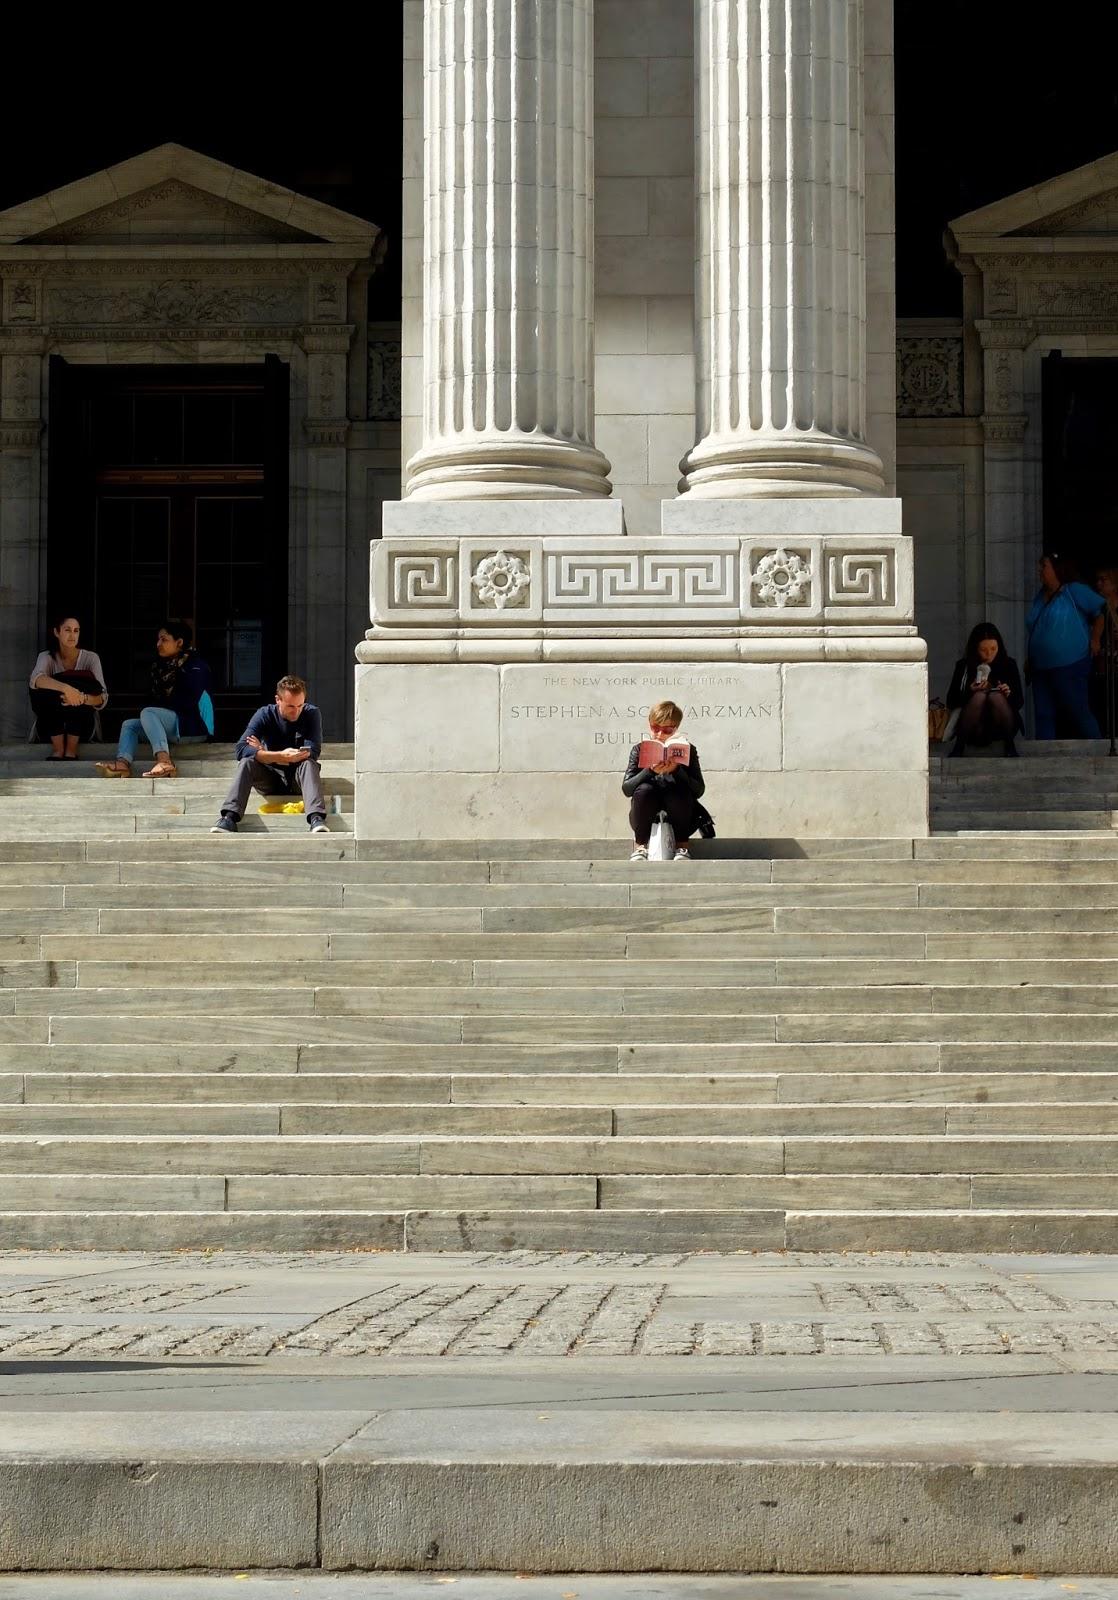 New york public library photo permit — 2